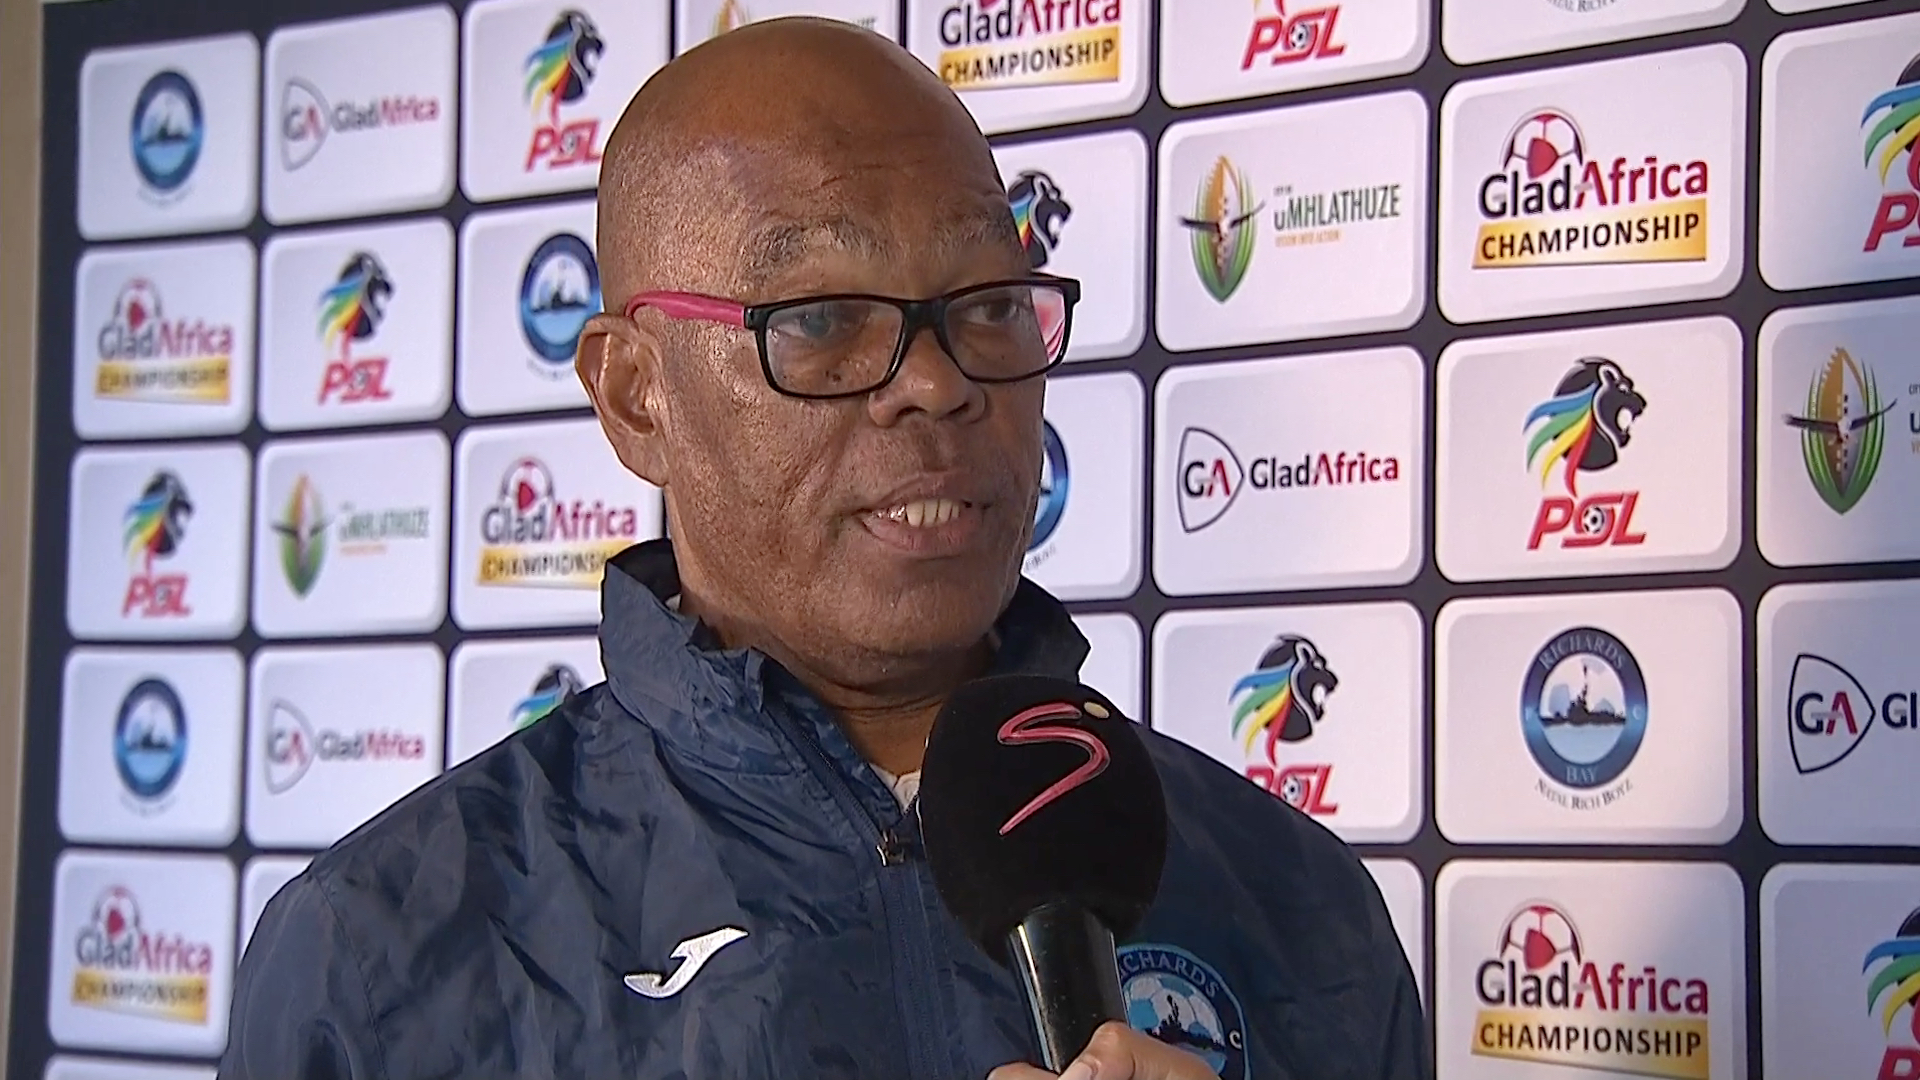 GladAfrica Championship   R Bay v Ajax CT   Post-match interview with Ian Palmer